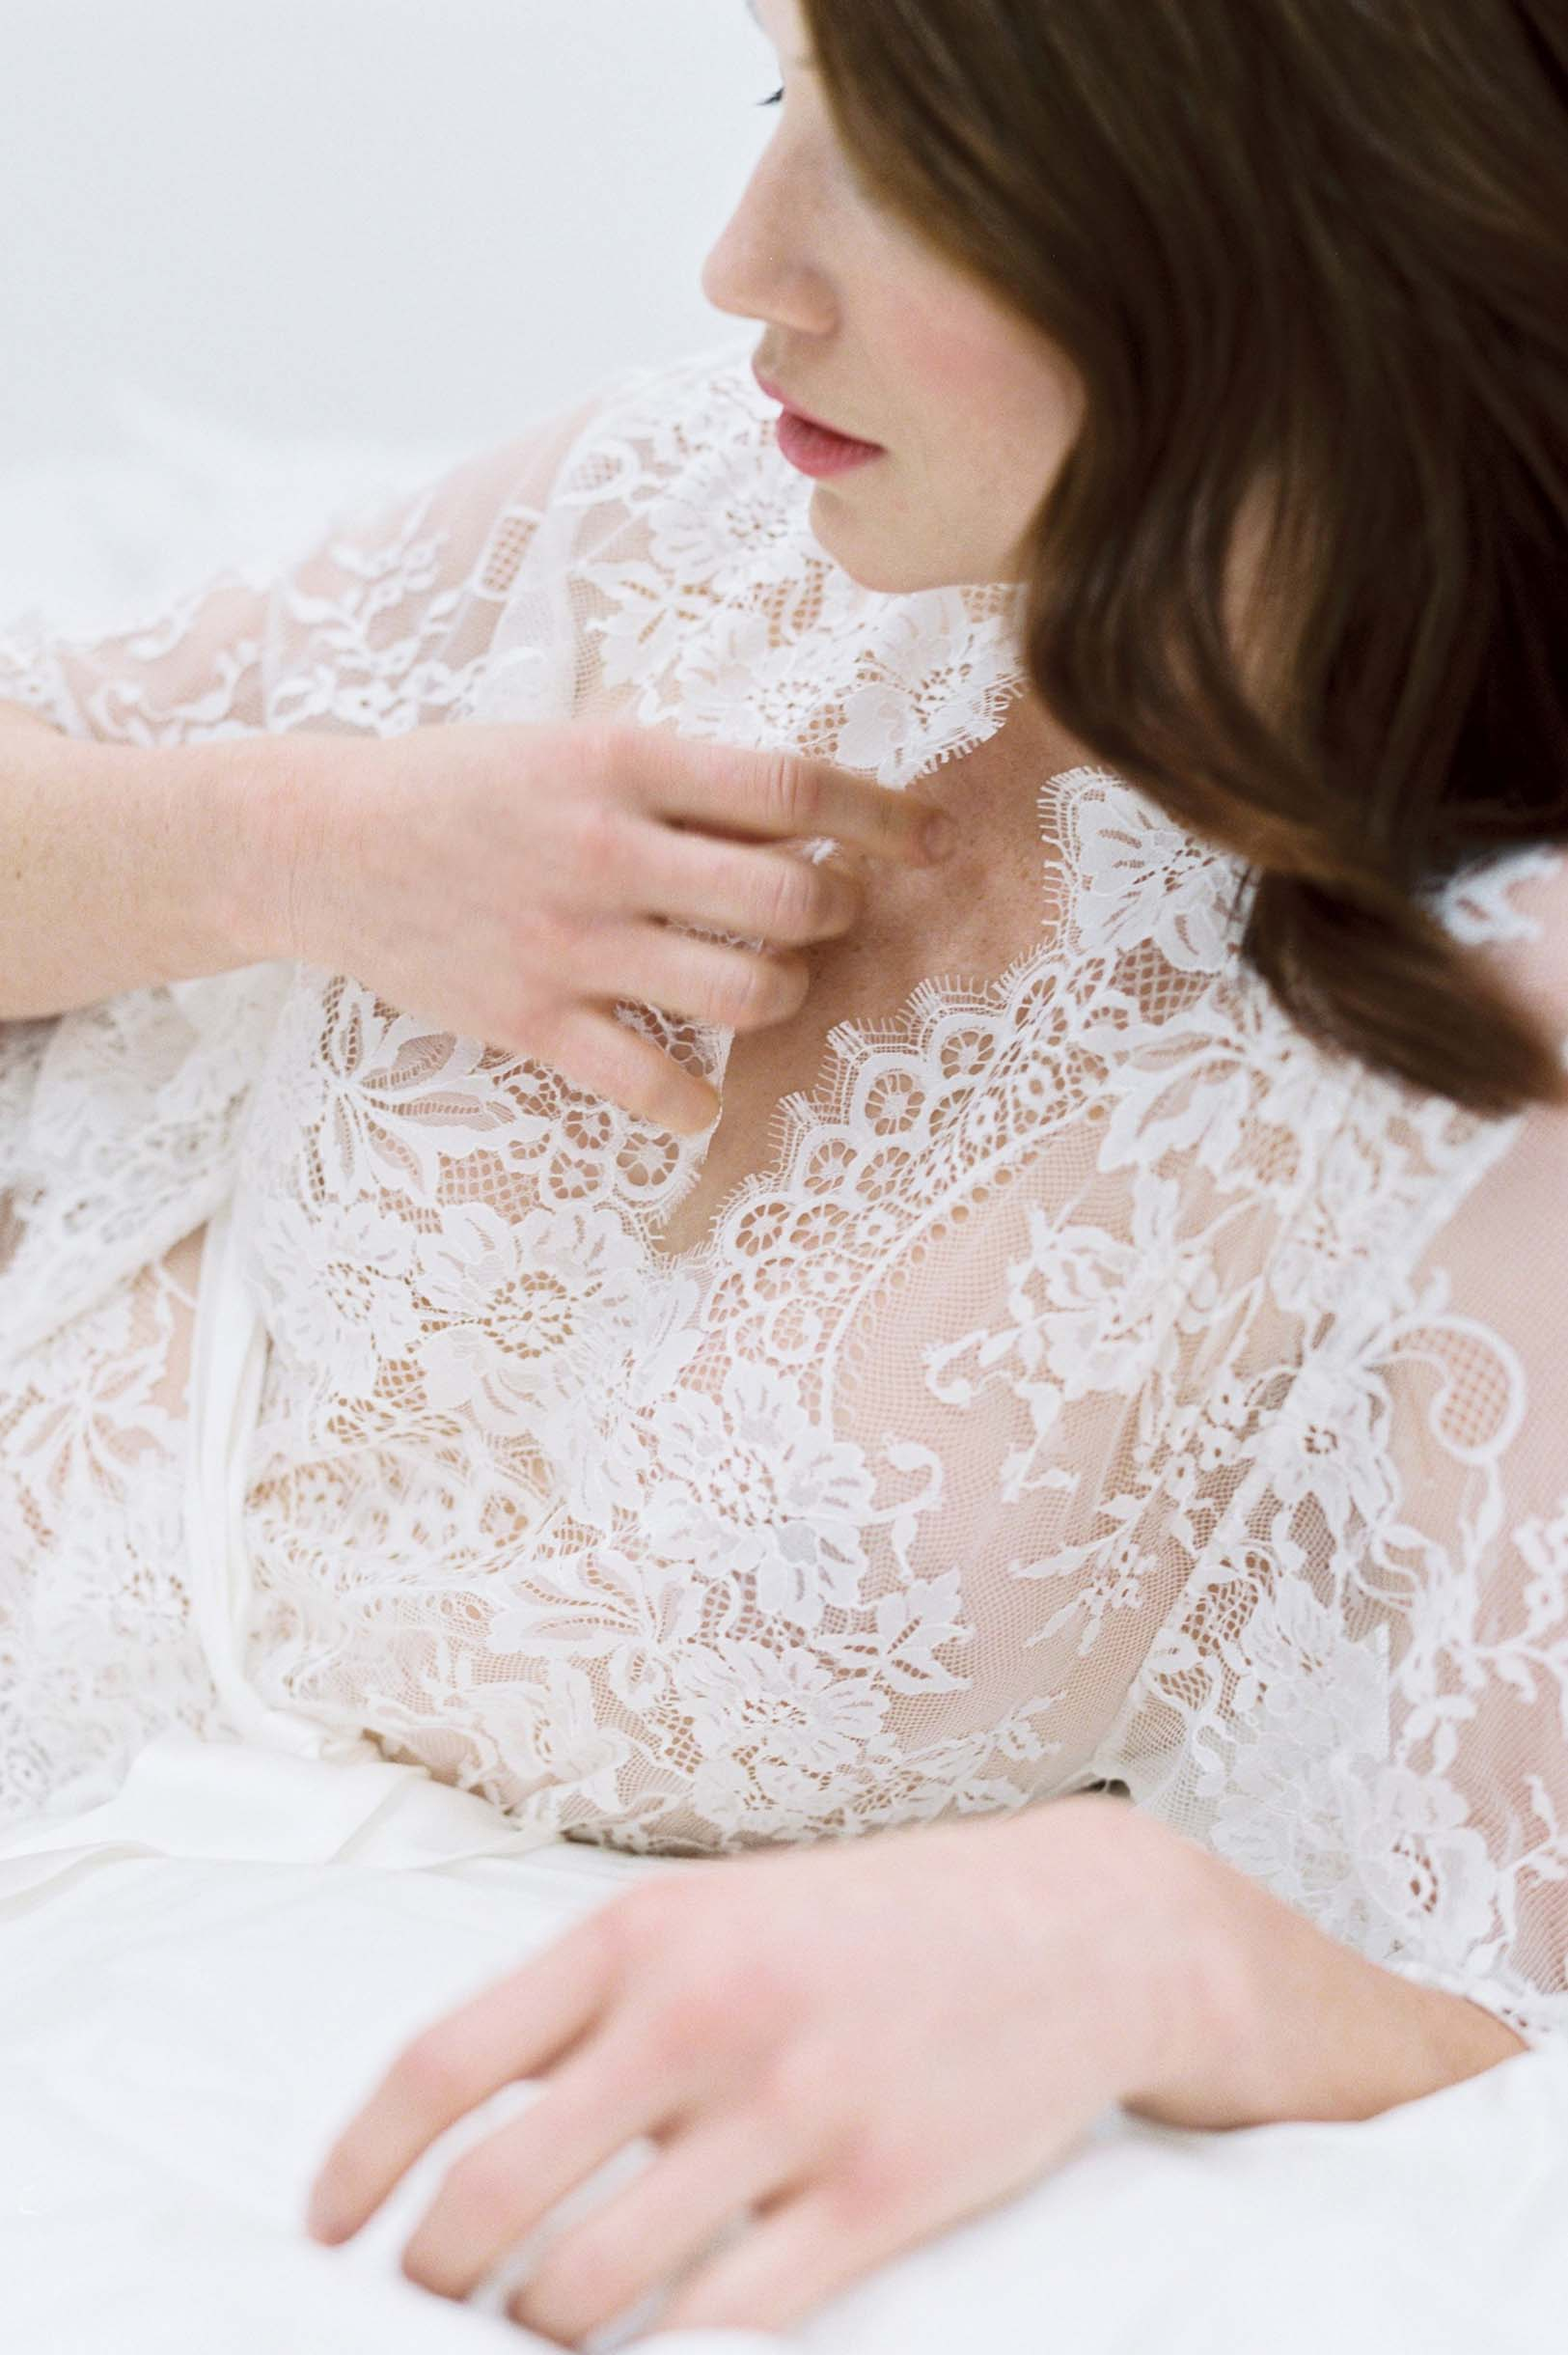 GirlandaSeriousDream Swan Queen lace robe ivory bride getting ready kimono wedding morning.jpg